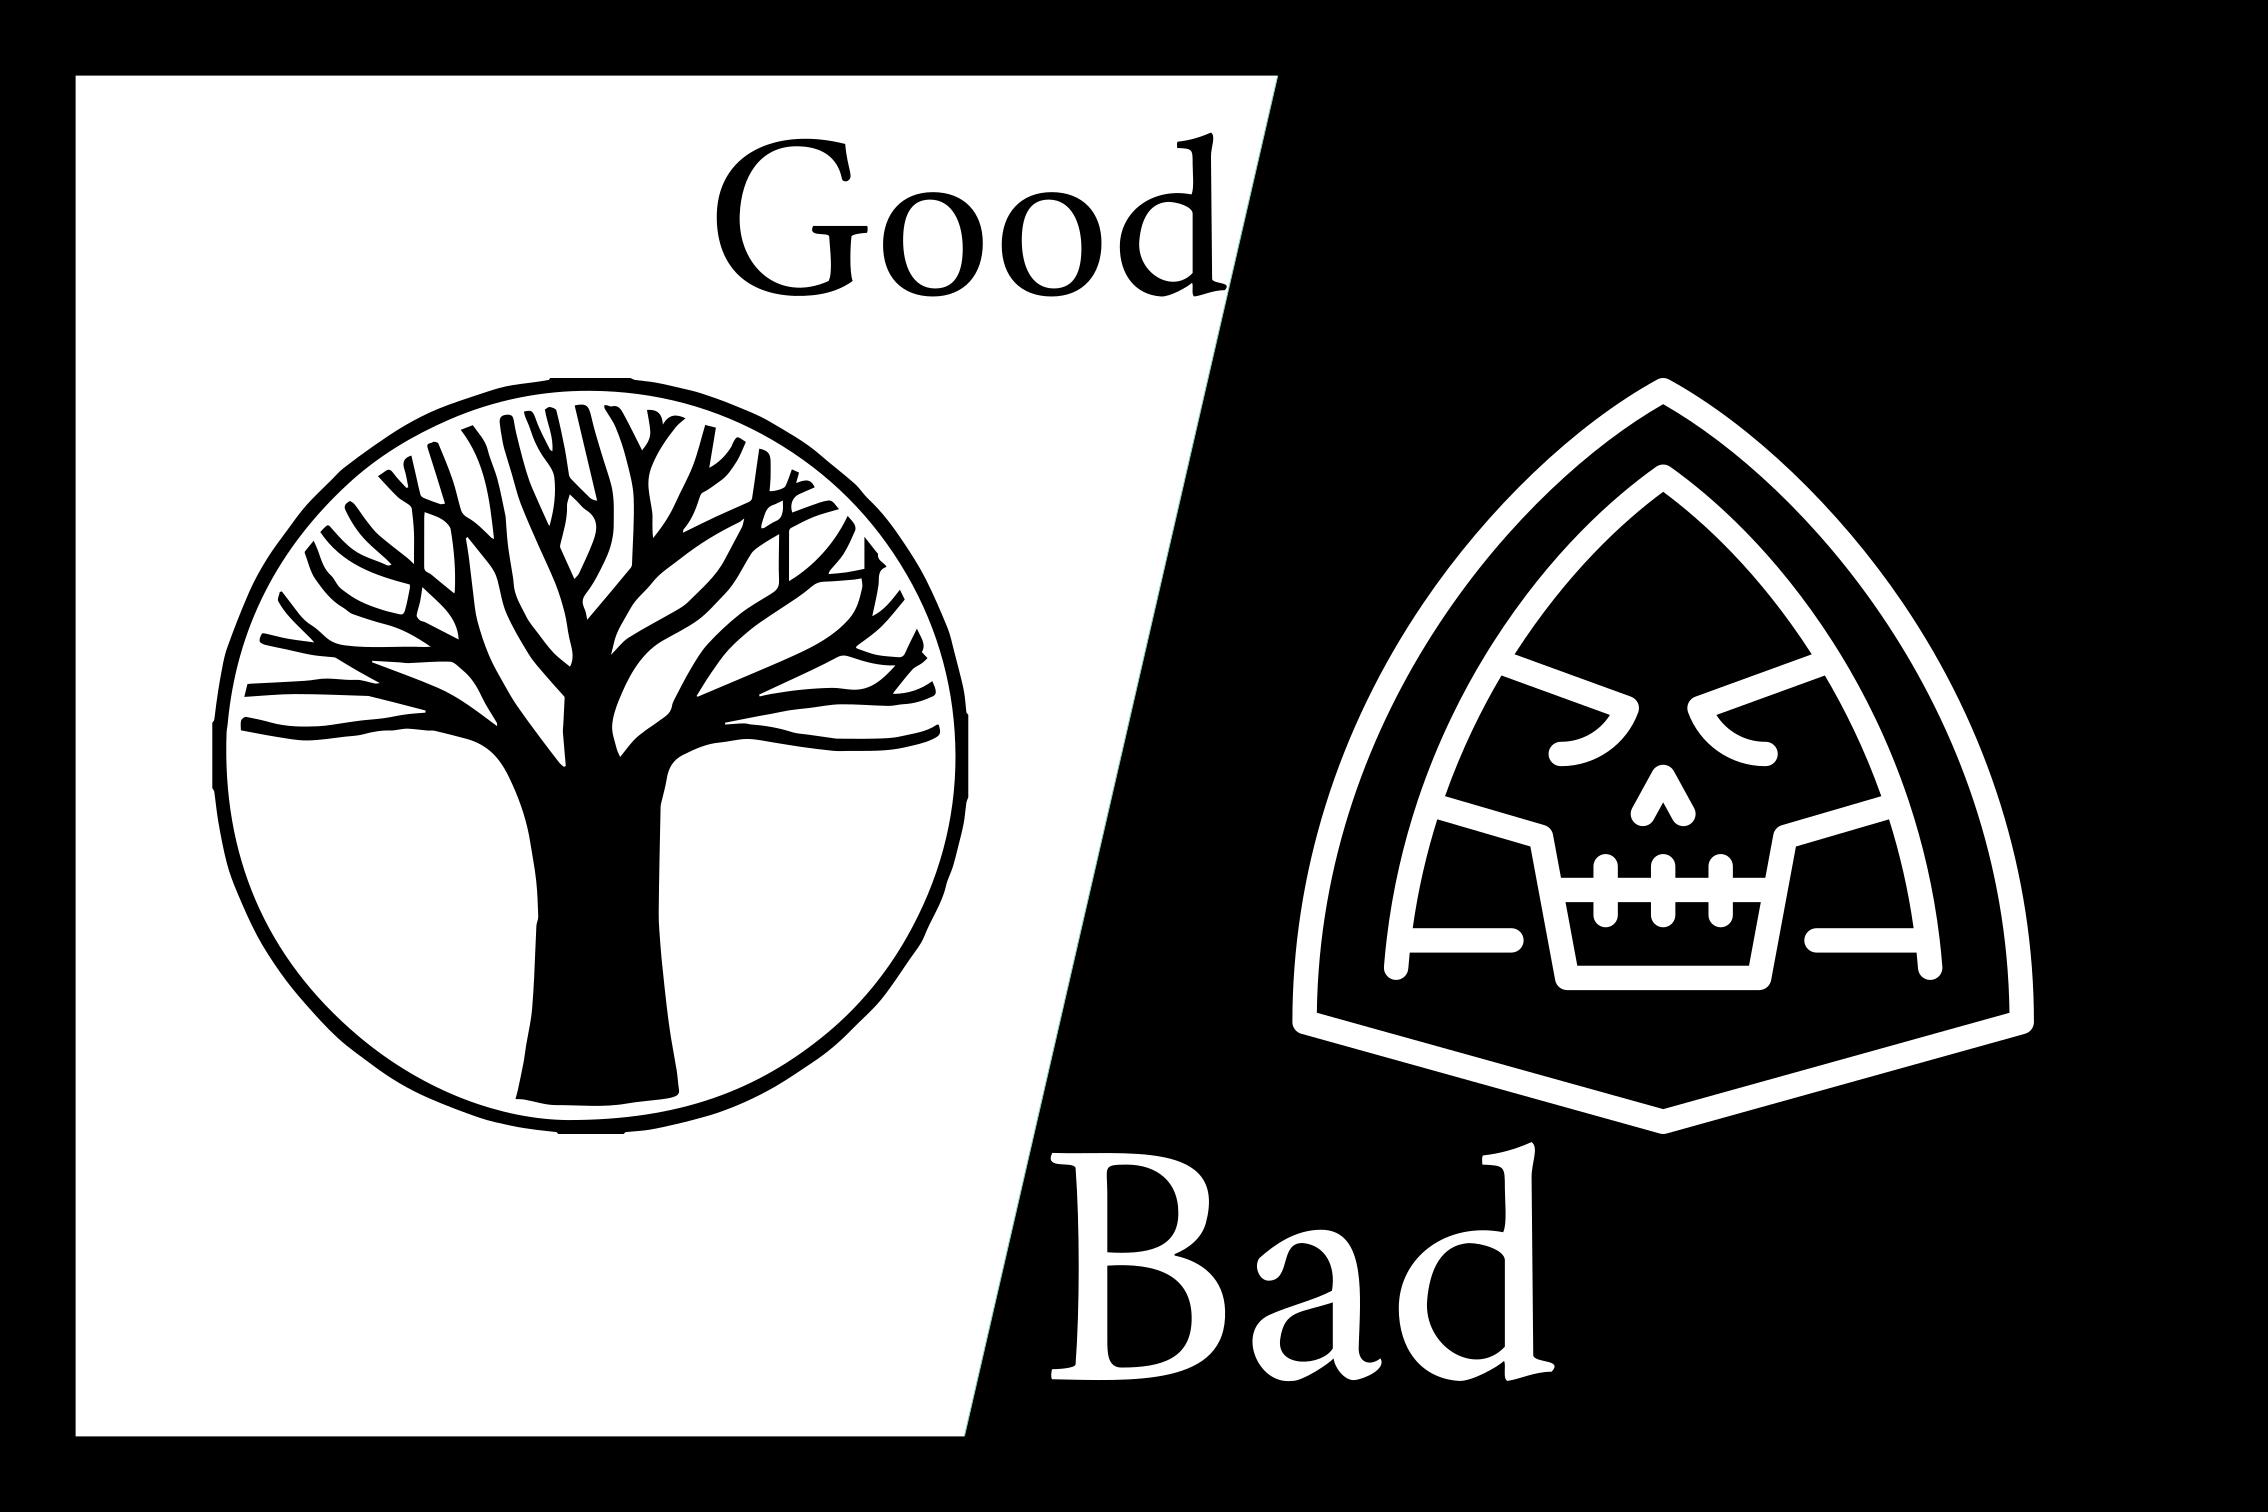 Design Good & Bad